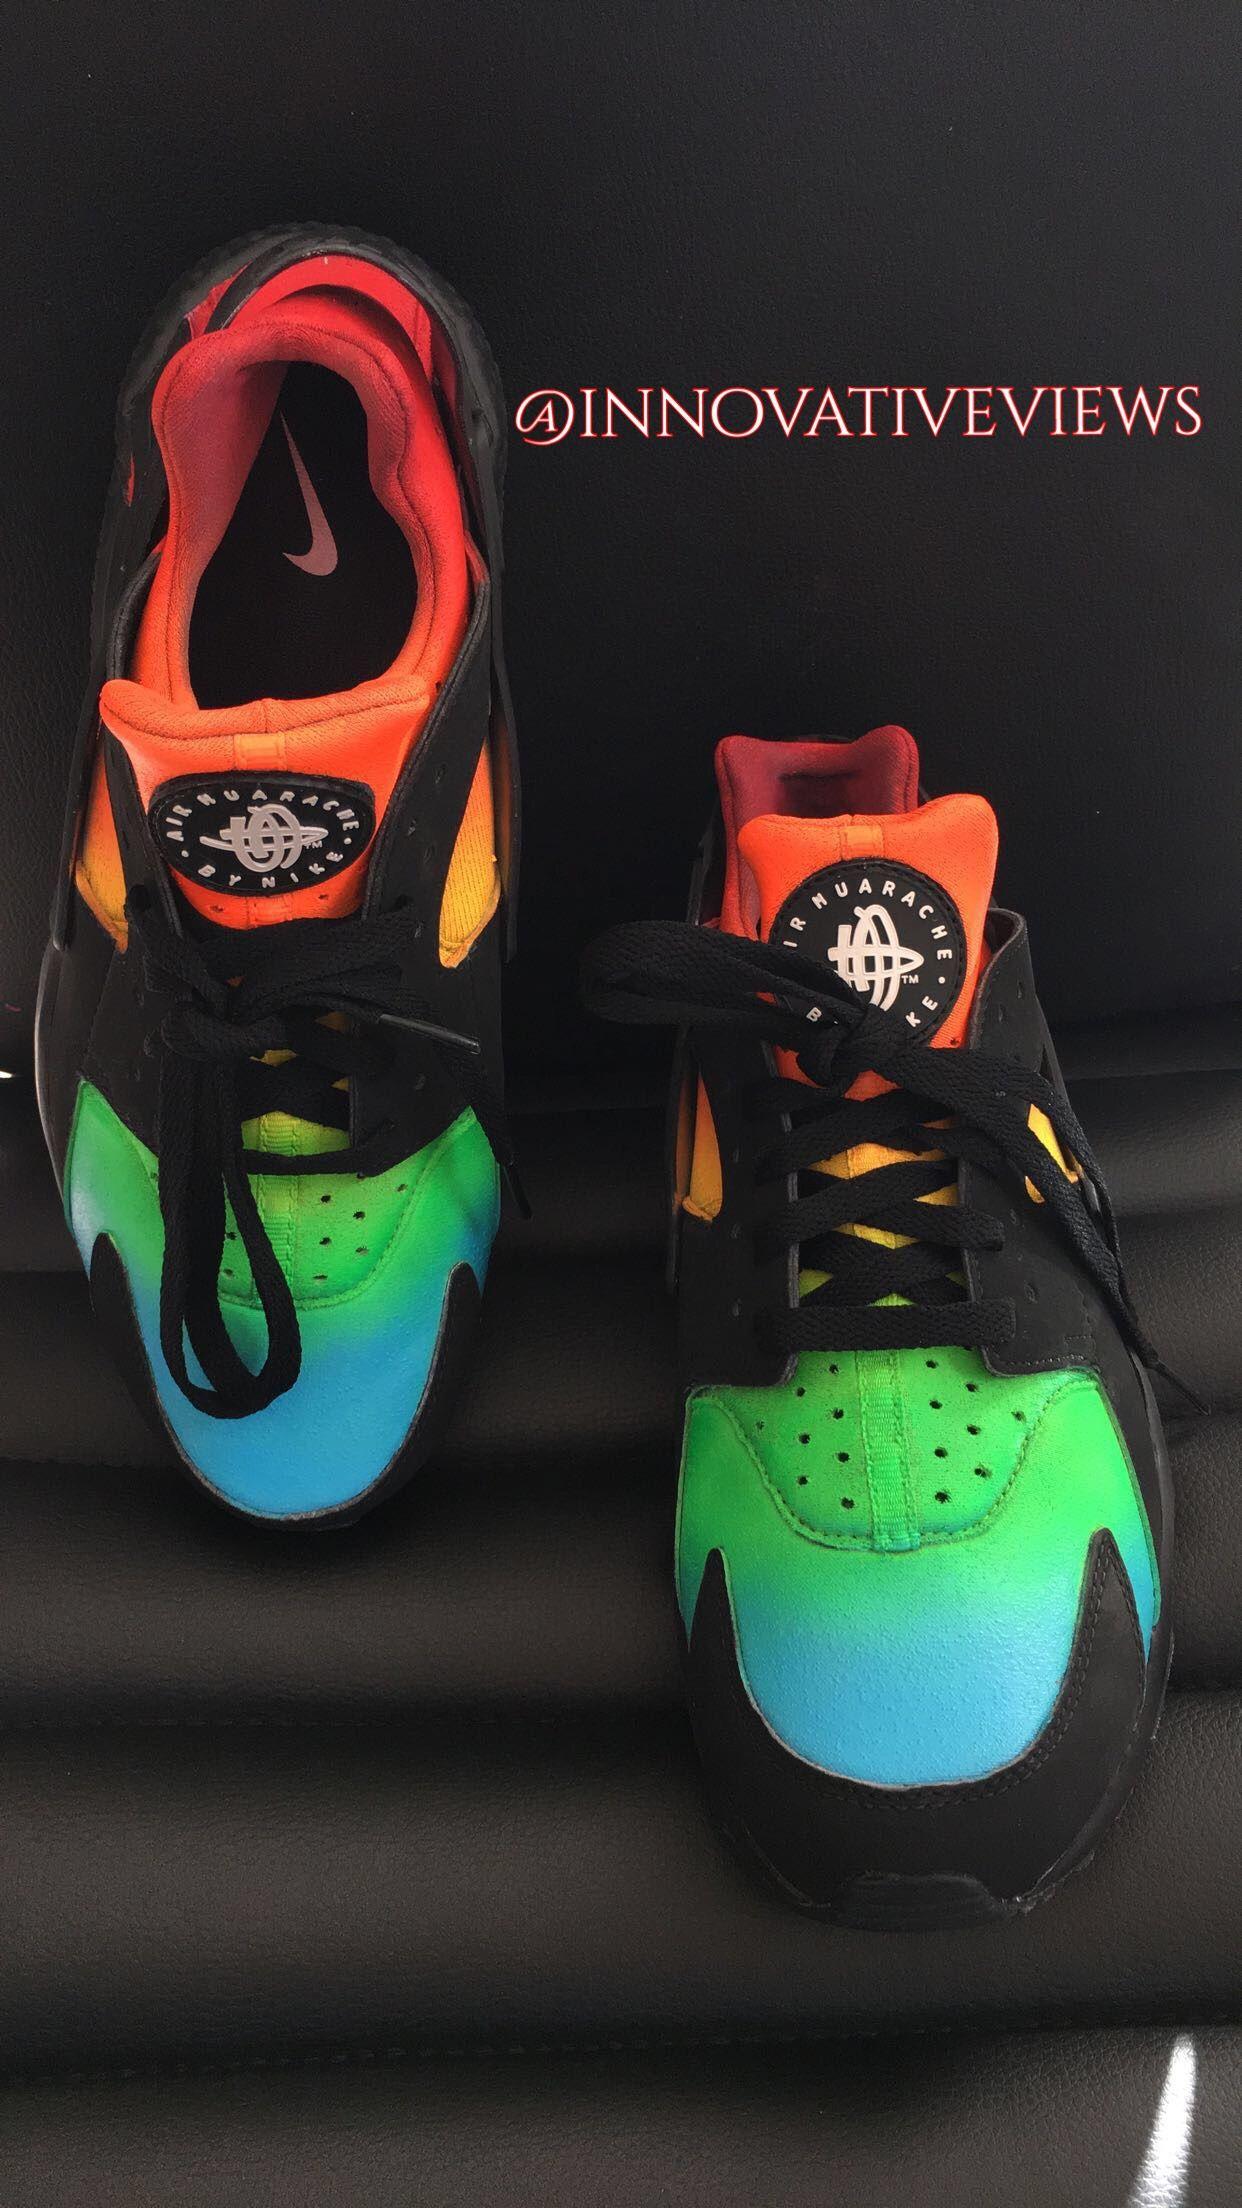 47a2636bc2fe Multi-Color Trainers for sale Custom shoe art!  art  sneakerhead  dope   fashion  shoes